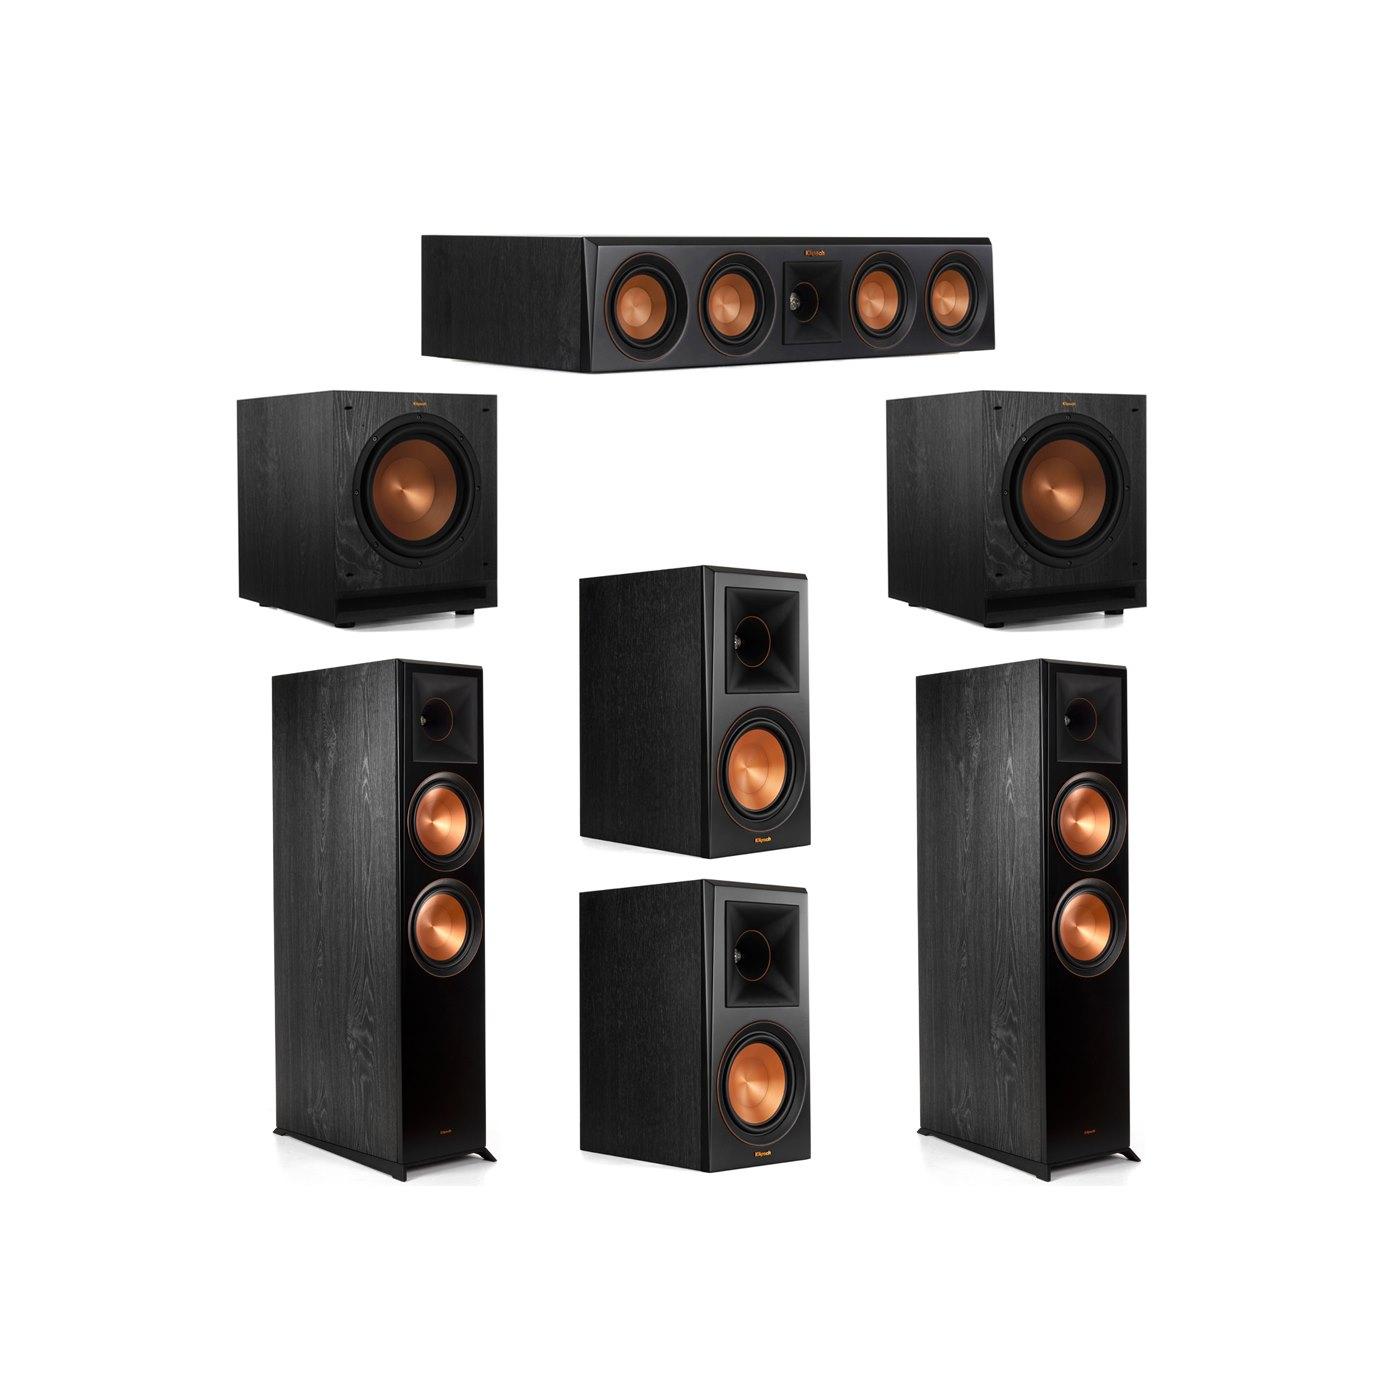 Klipsch 5.2 System with 2 RP-8000F Floorstanding Speakers, 1 Klipsch RP-404C Center Speaker, 2 Klipsch RP-600M Surround Speakers, 2 Klipsch SPL-100 Subwoofers